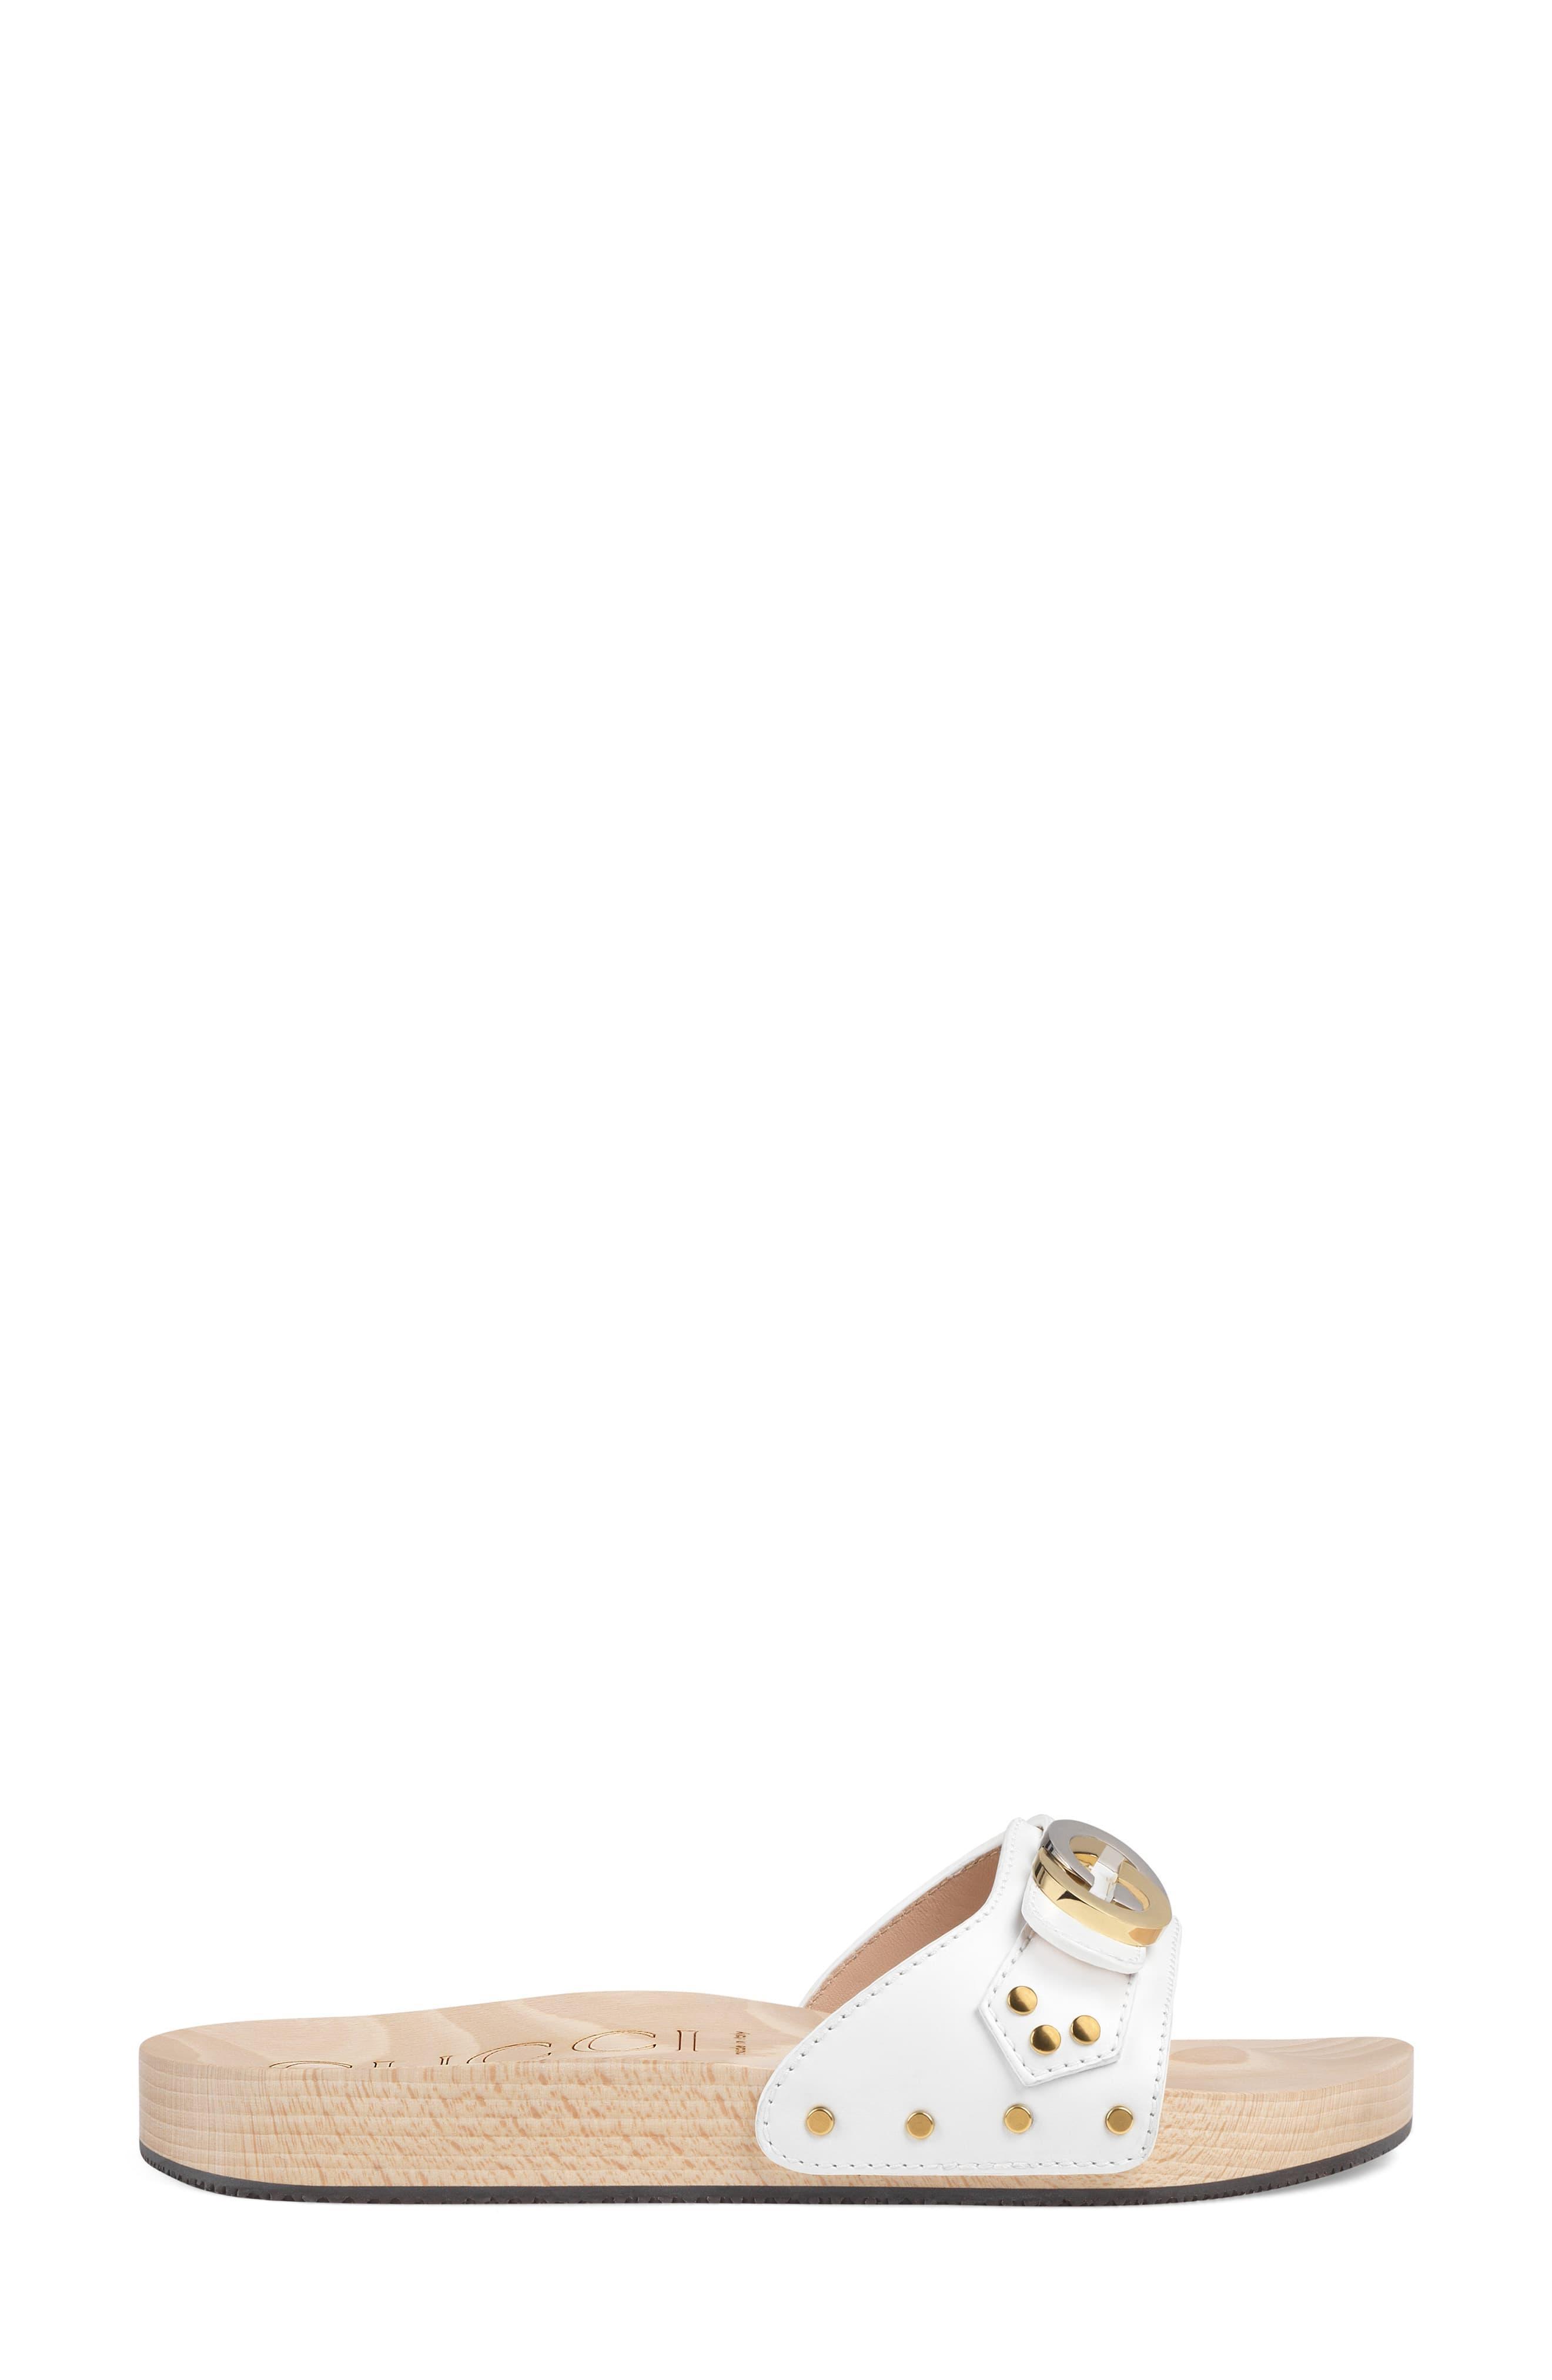 a1fbee757 Gucci - White Shiner Interlocking-g Slide Sandal - Lyst. View fullscreen